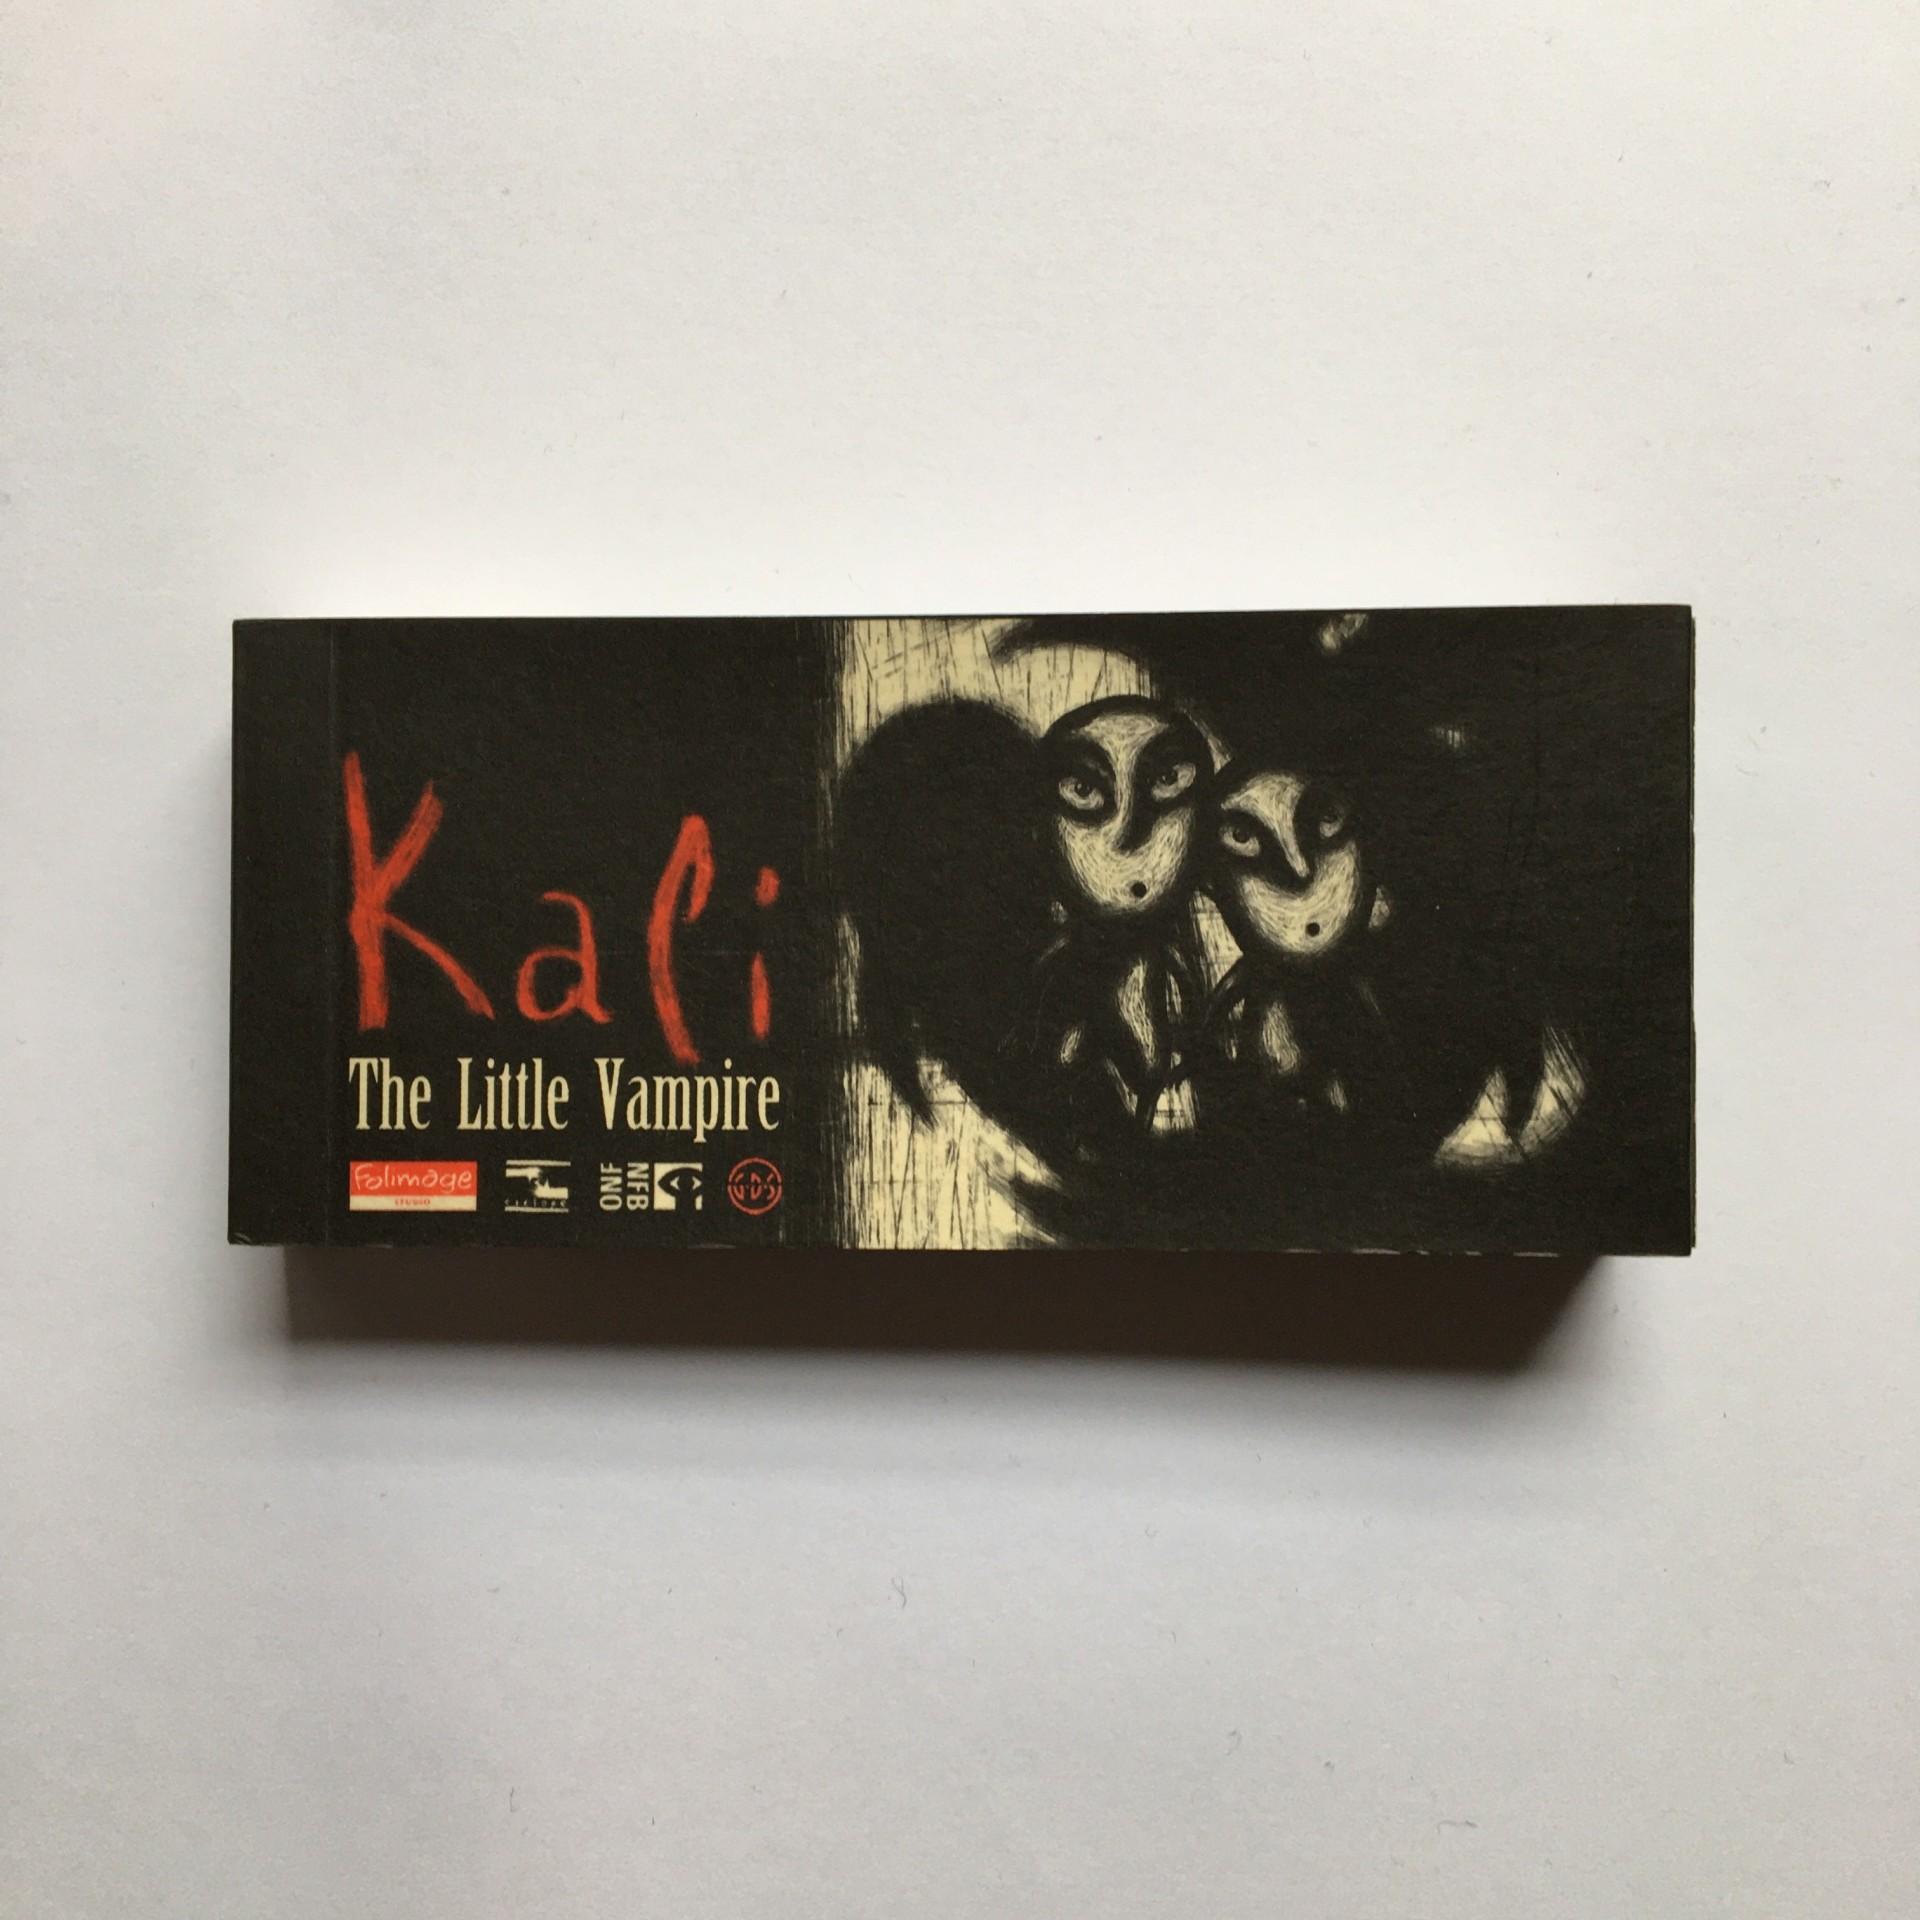 Flipbook Kali, The Little Vampire